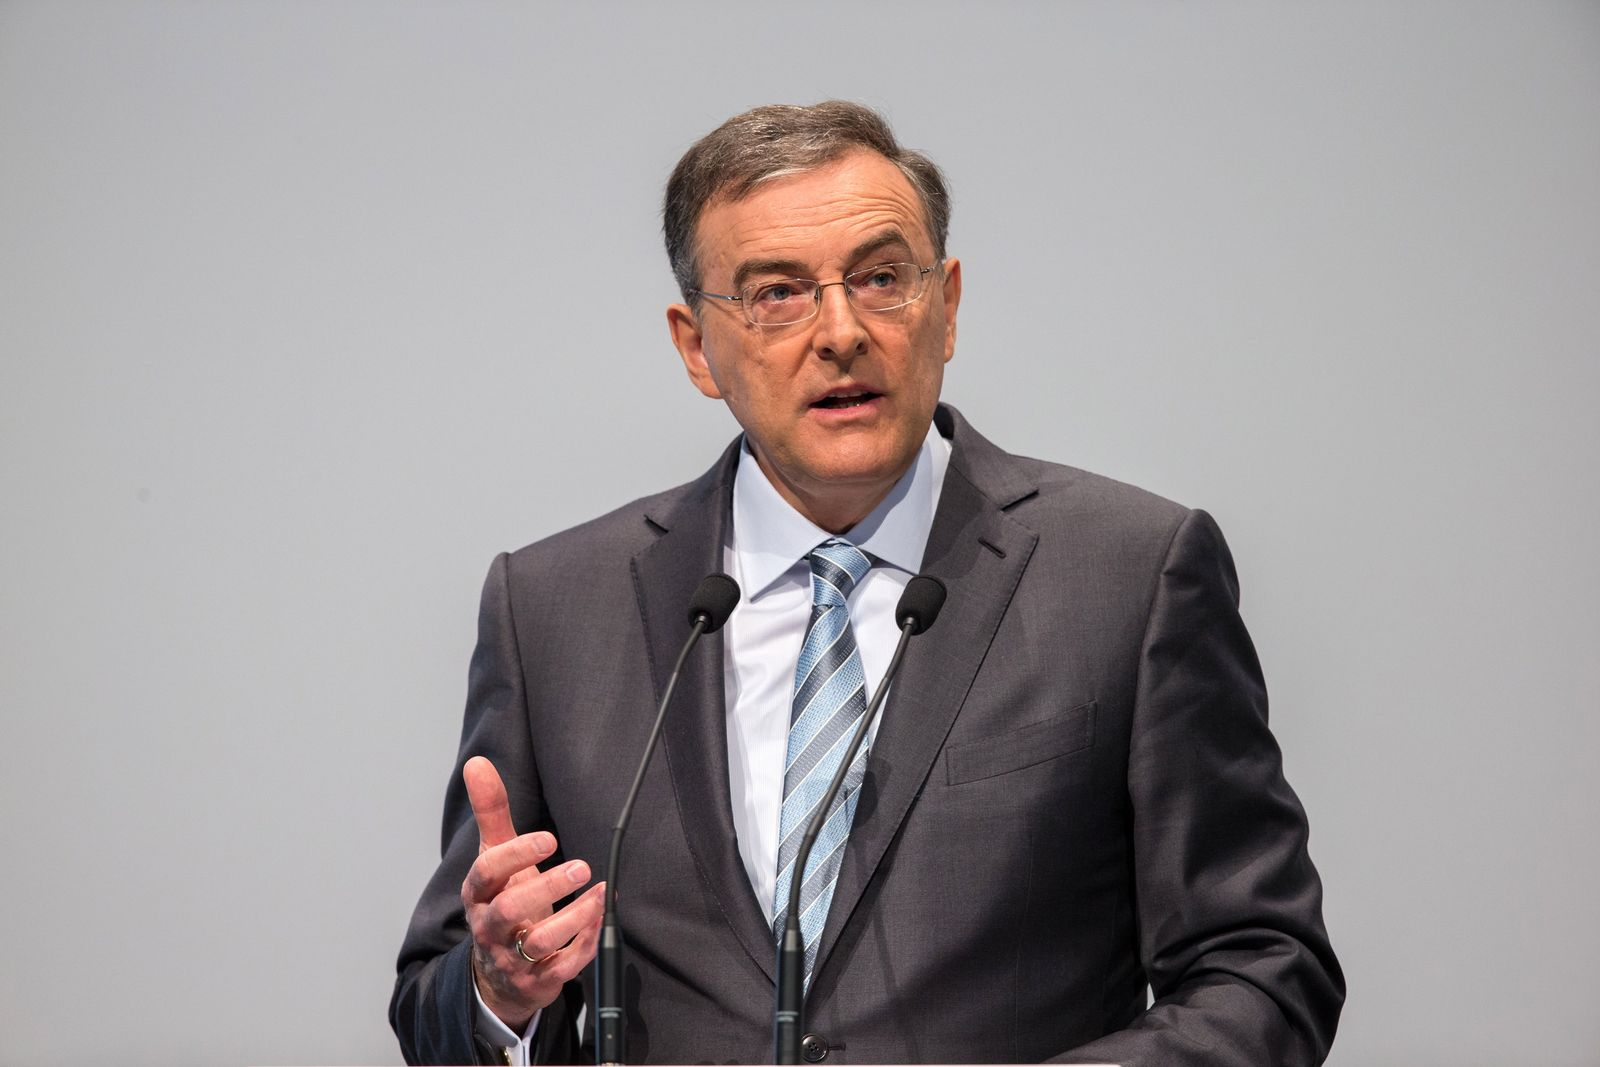 BMW Hauptversammlung 2013 / Norbert Reithofer